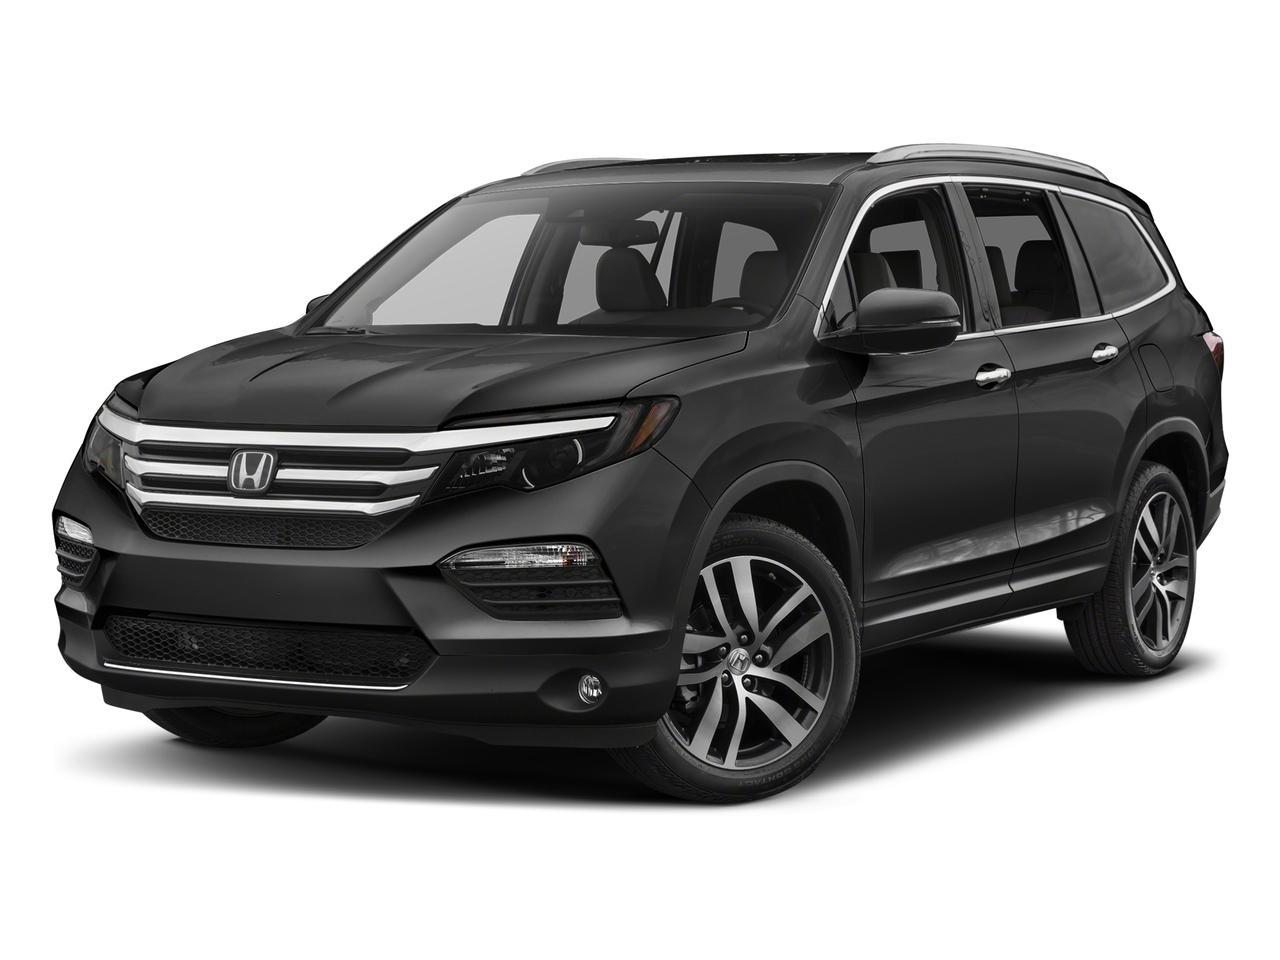 2017 Honda Pilot Vehicle Photo in San Antonio, TX 78238